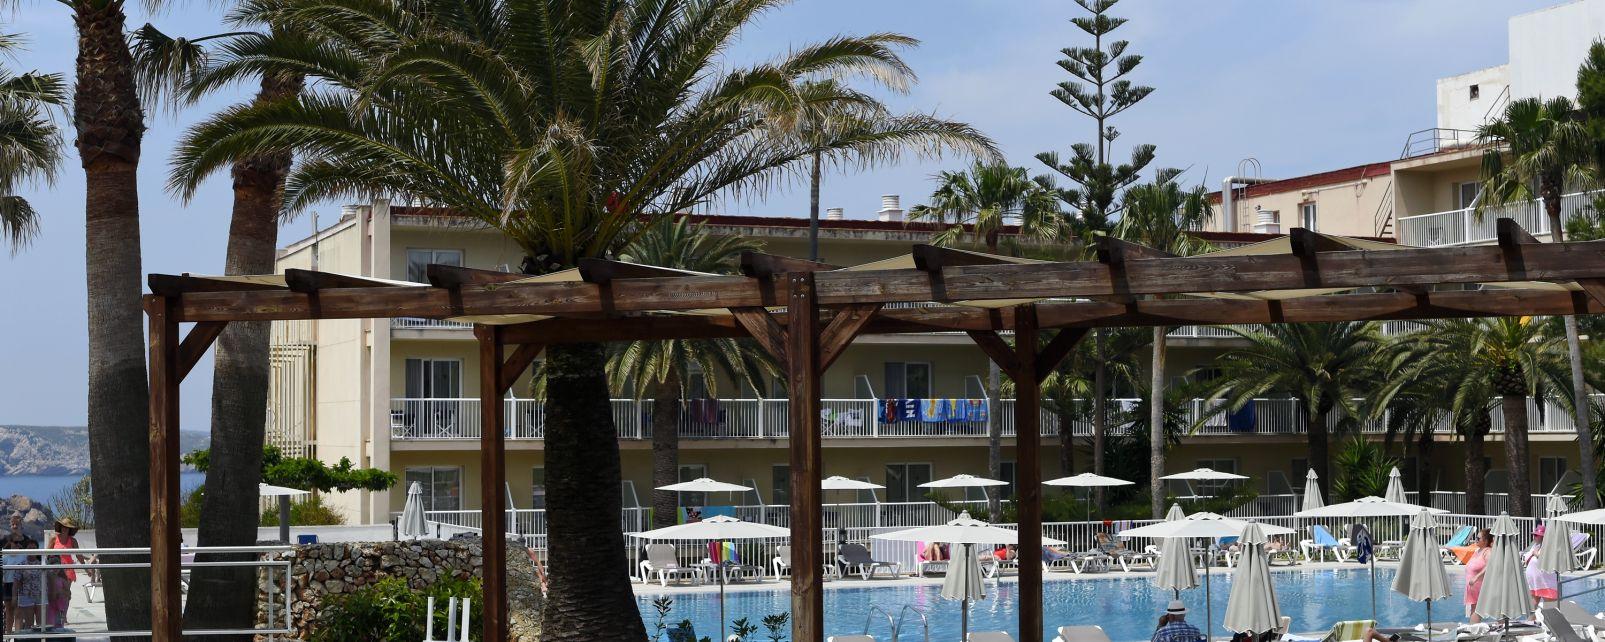 Hôtel Club hôtel Aguamarina